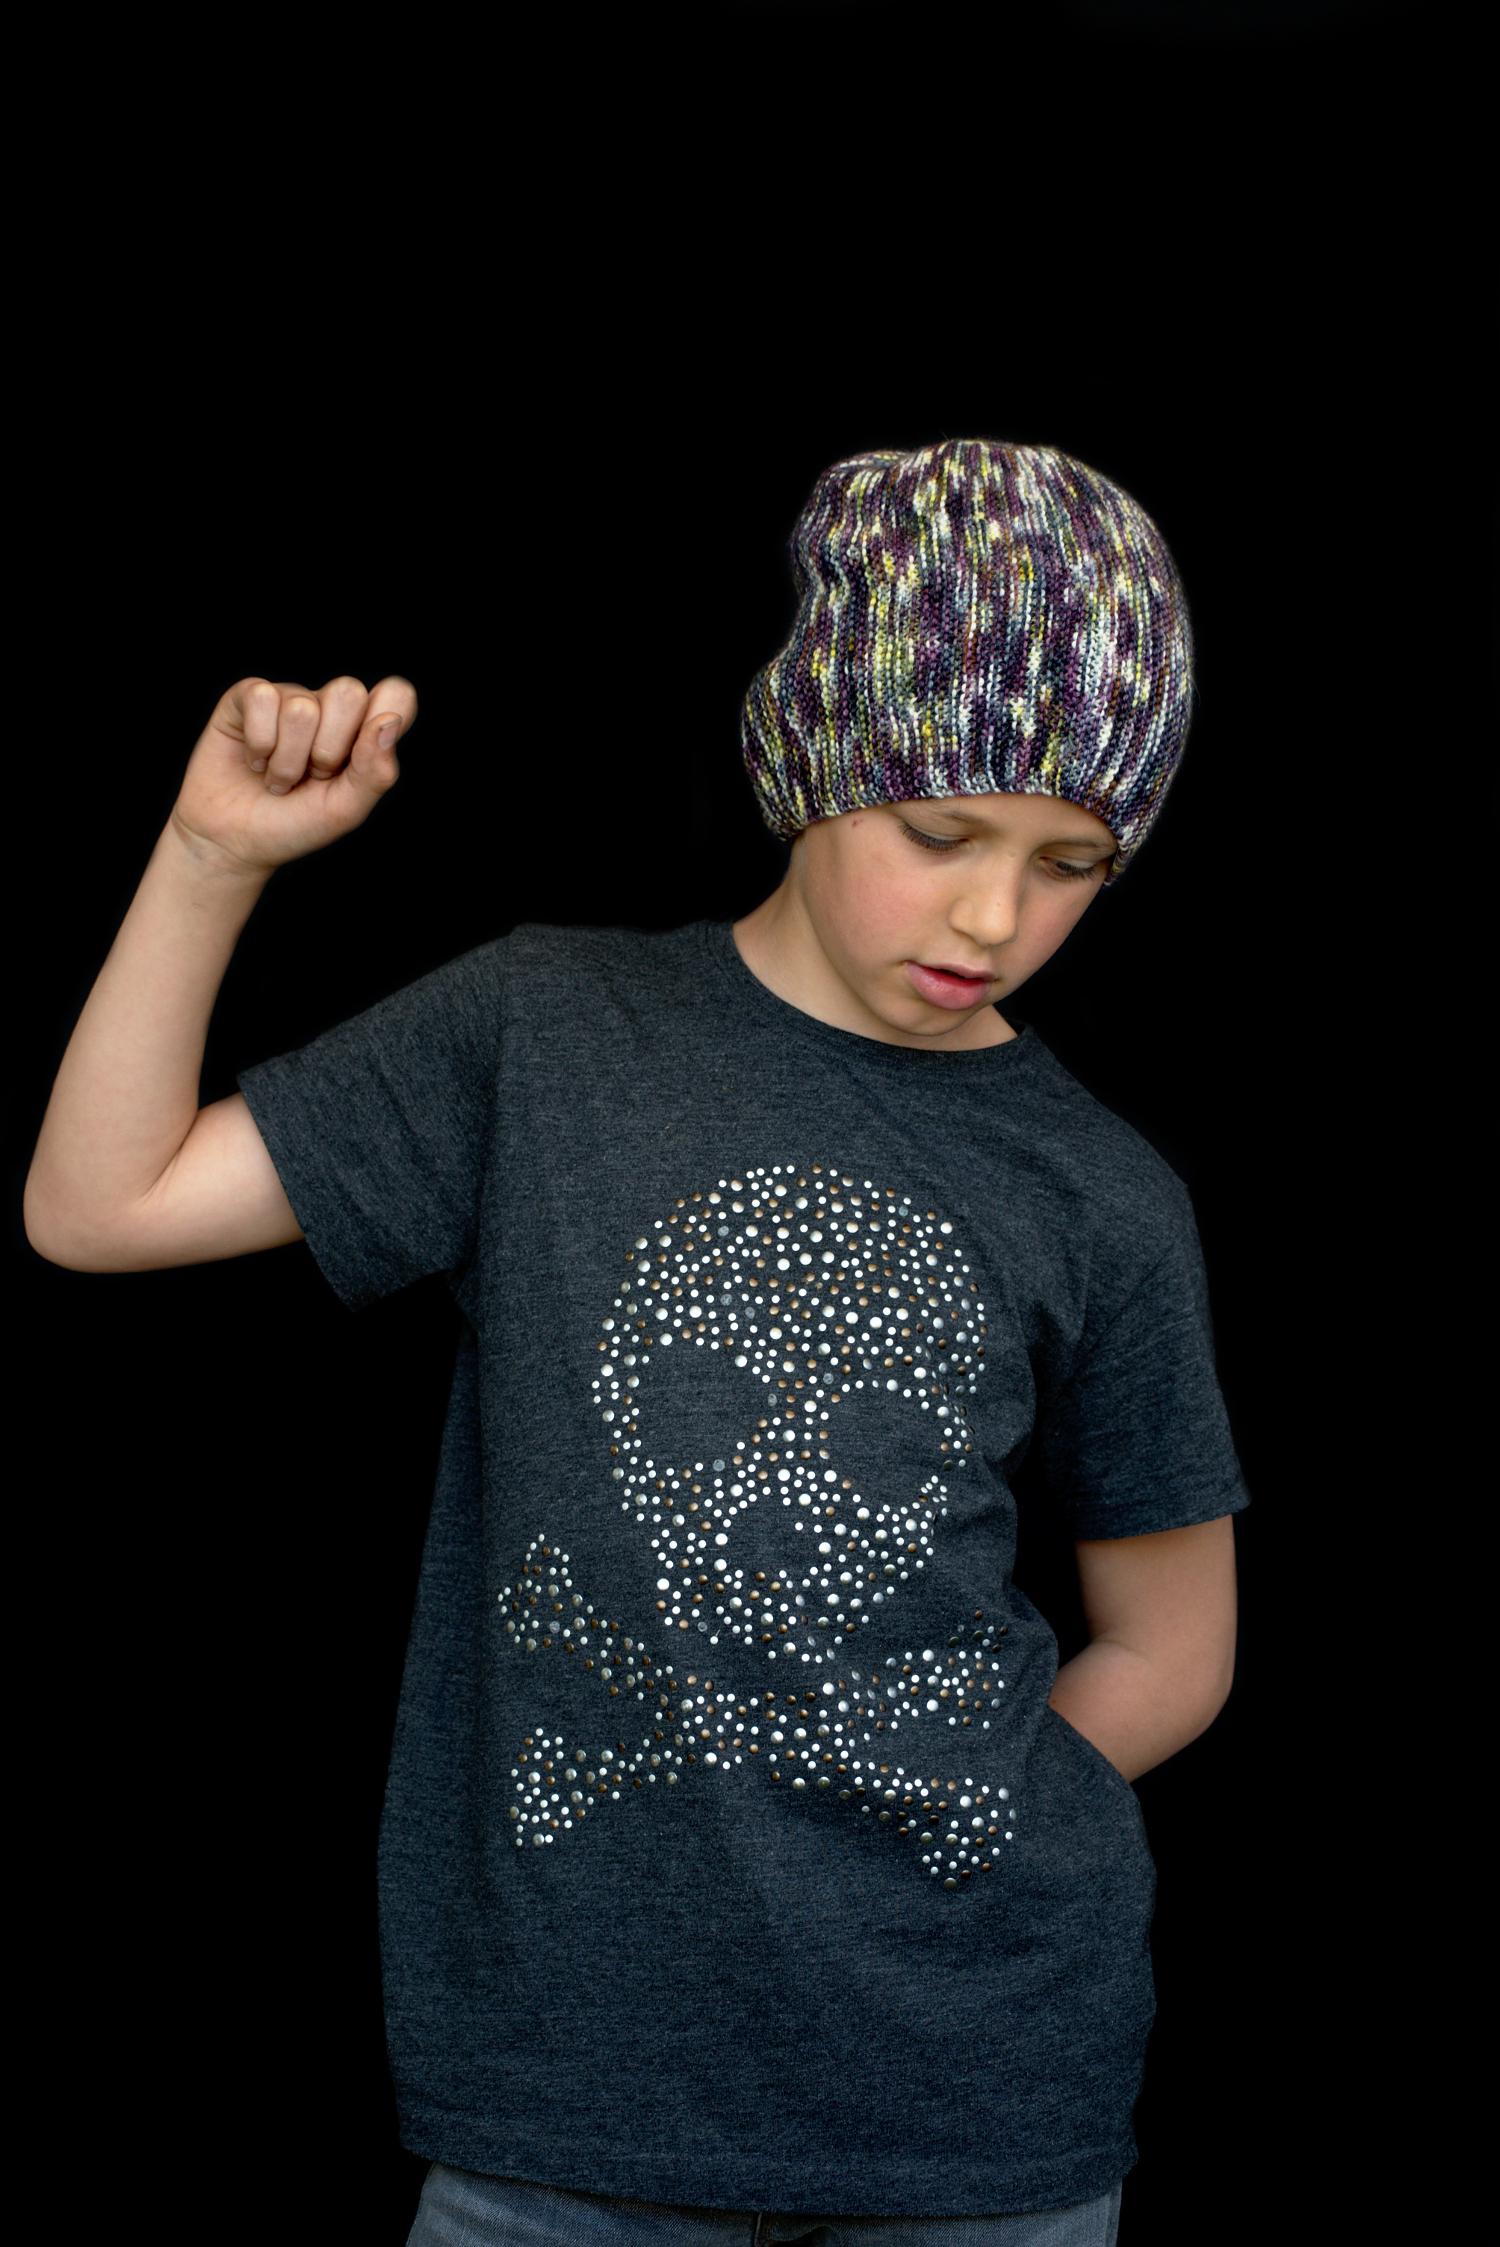 Kelvinside hand knitting pattern for a slouchy Hat